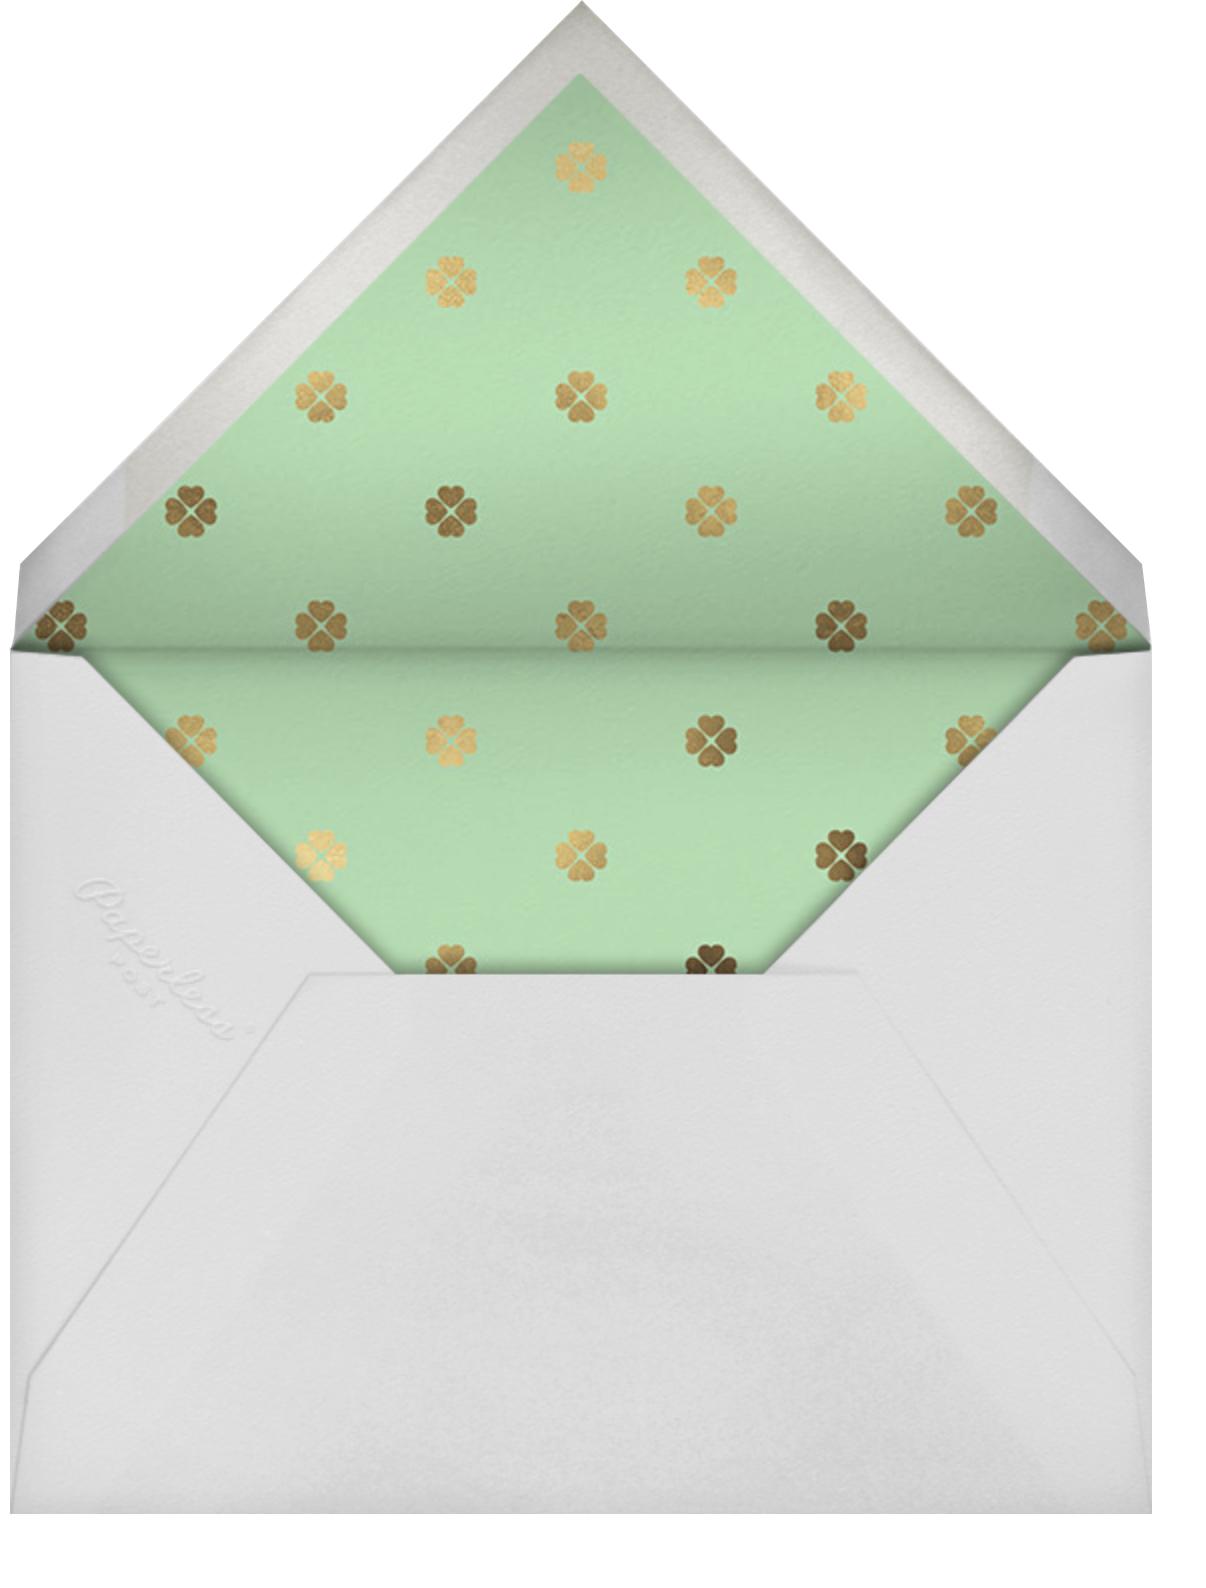 Colorblocked Border - Green/Blue - kate spade new york - Adult birthday - envelope back